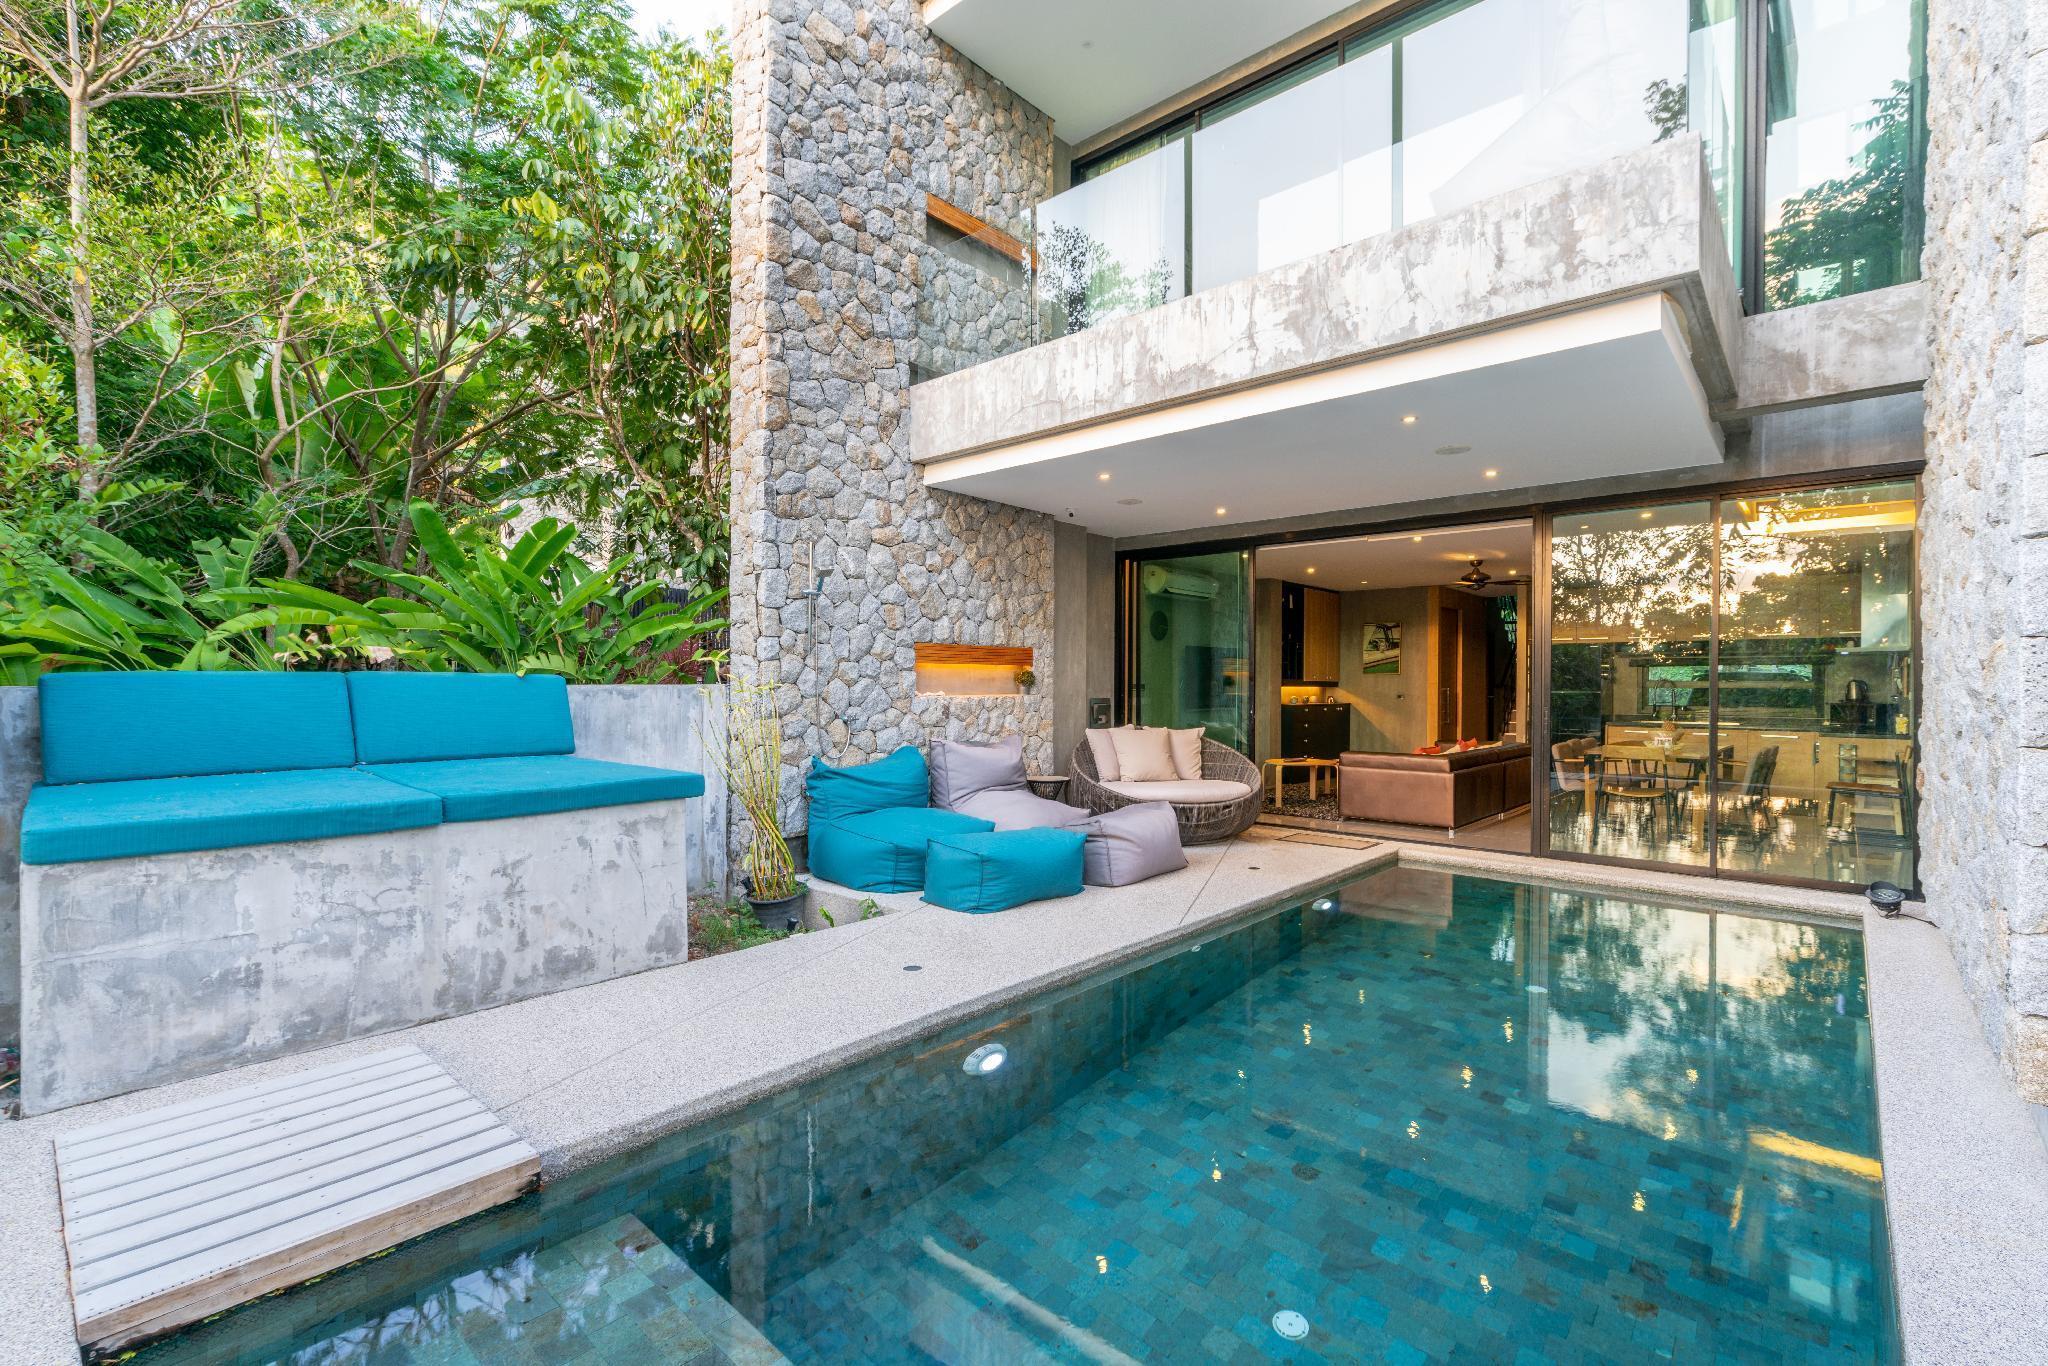 Luxury 4 Bedroom Villa Mangosteen วิลลา 4 ห้องนอน 3 ห้องน้ำส่วนตัว ขนาด 180 ตร.ม. – กมลา